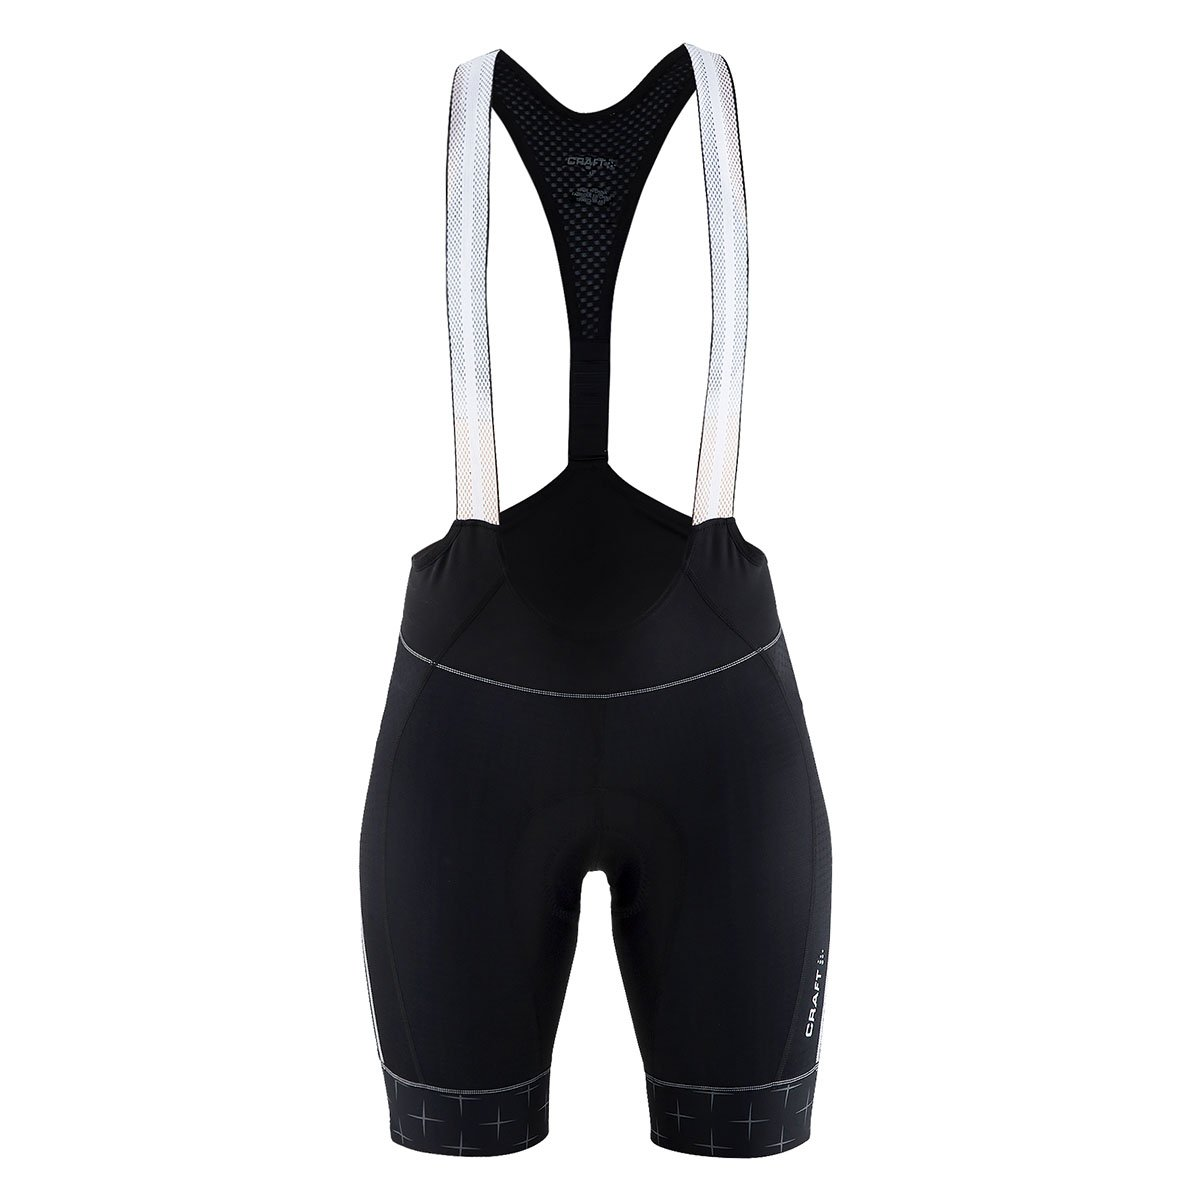 Image of Active Shorts Craft Womens Bib Bike Short: Reflective Glow Cycling Shorts